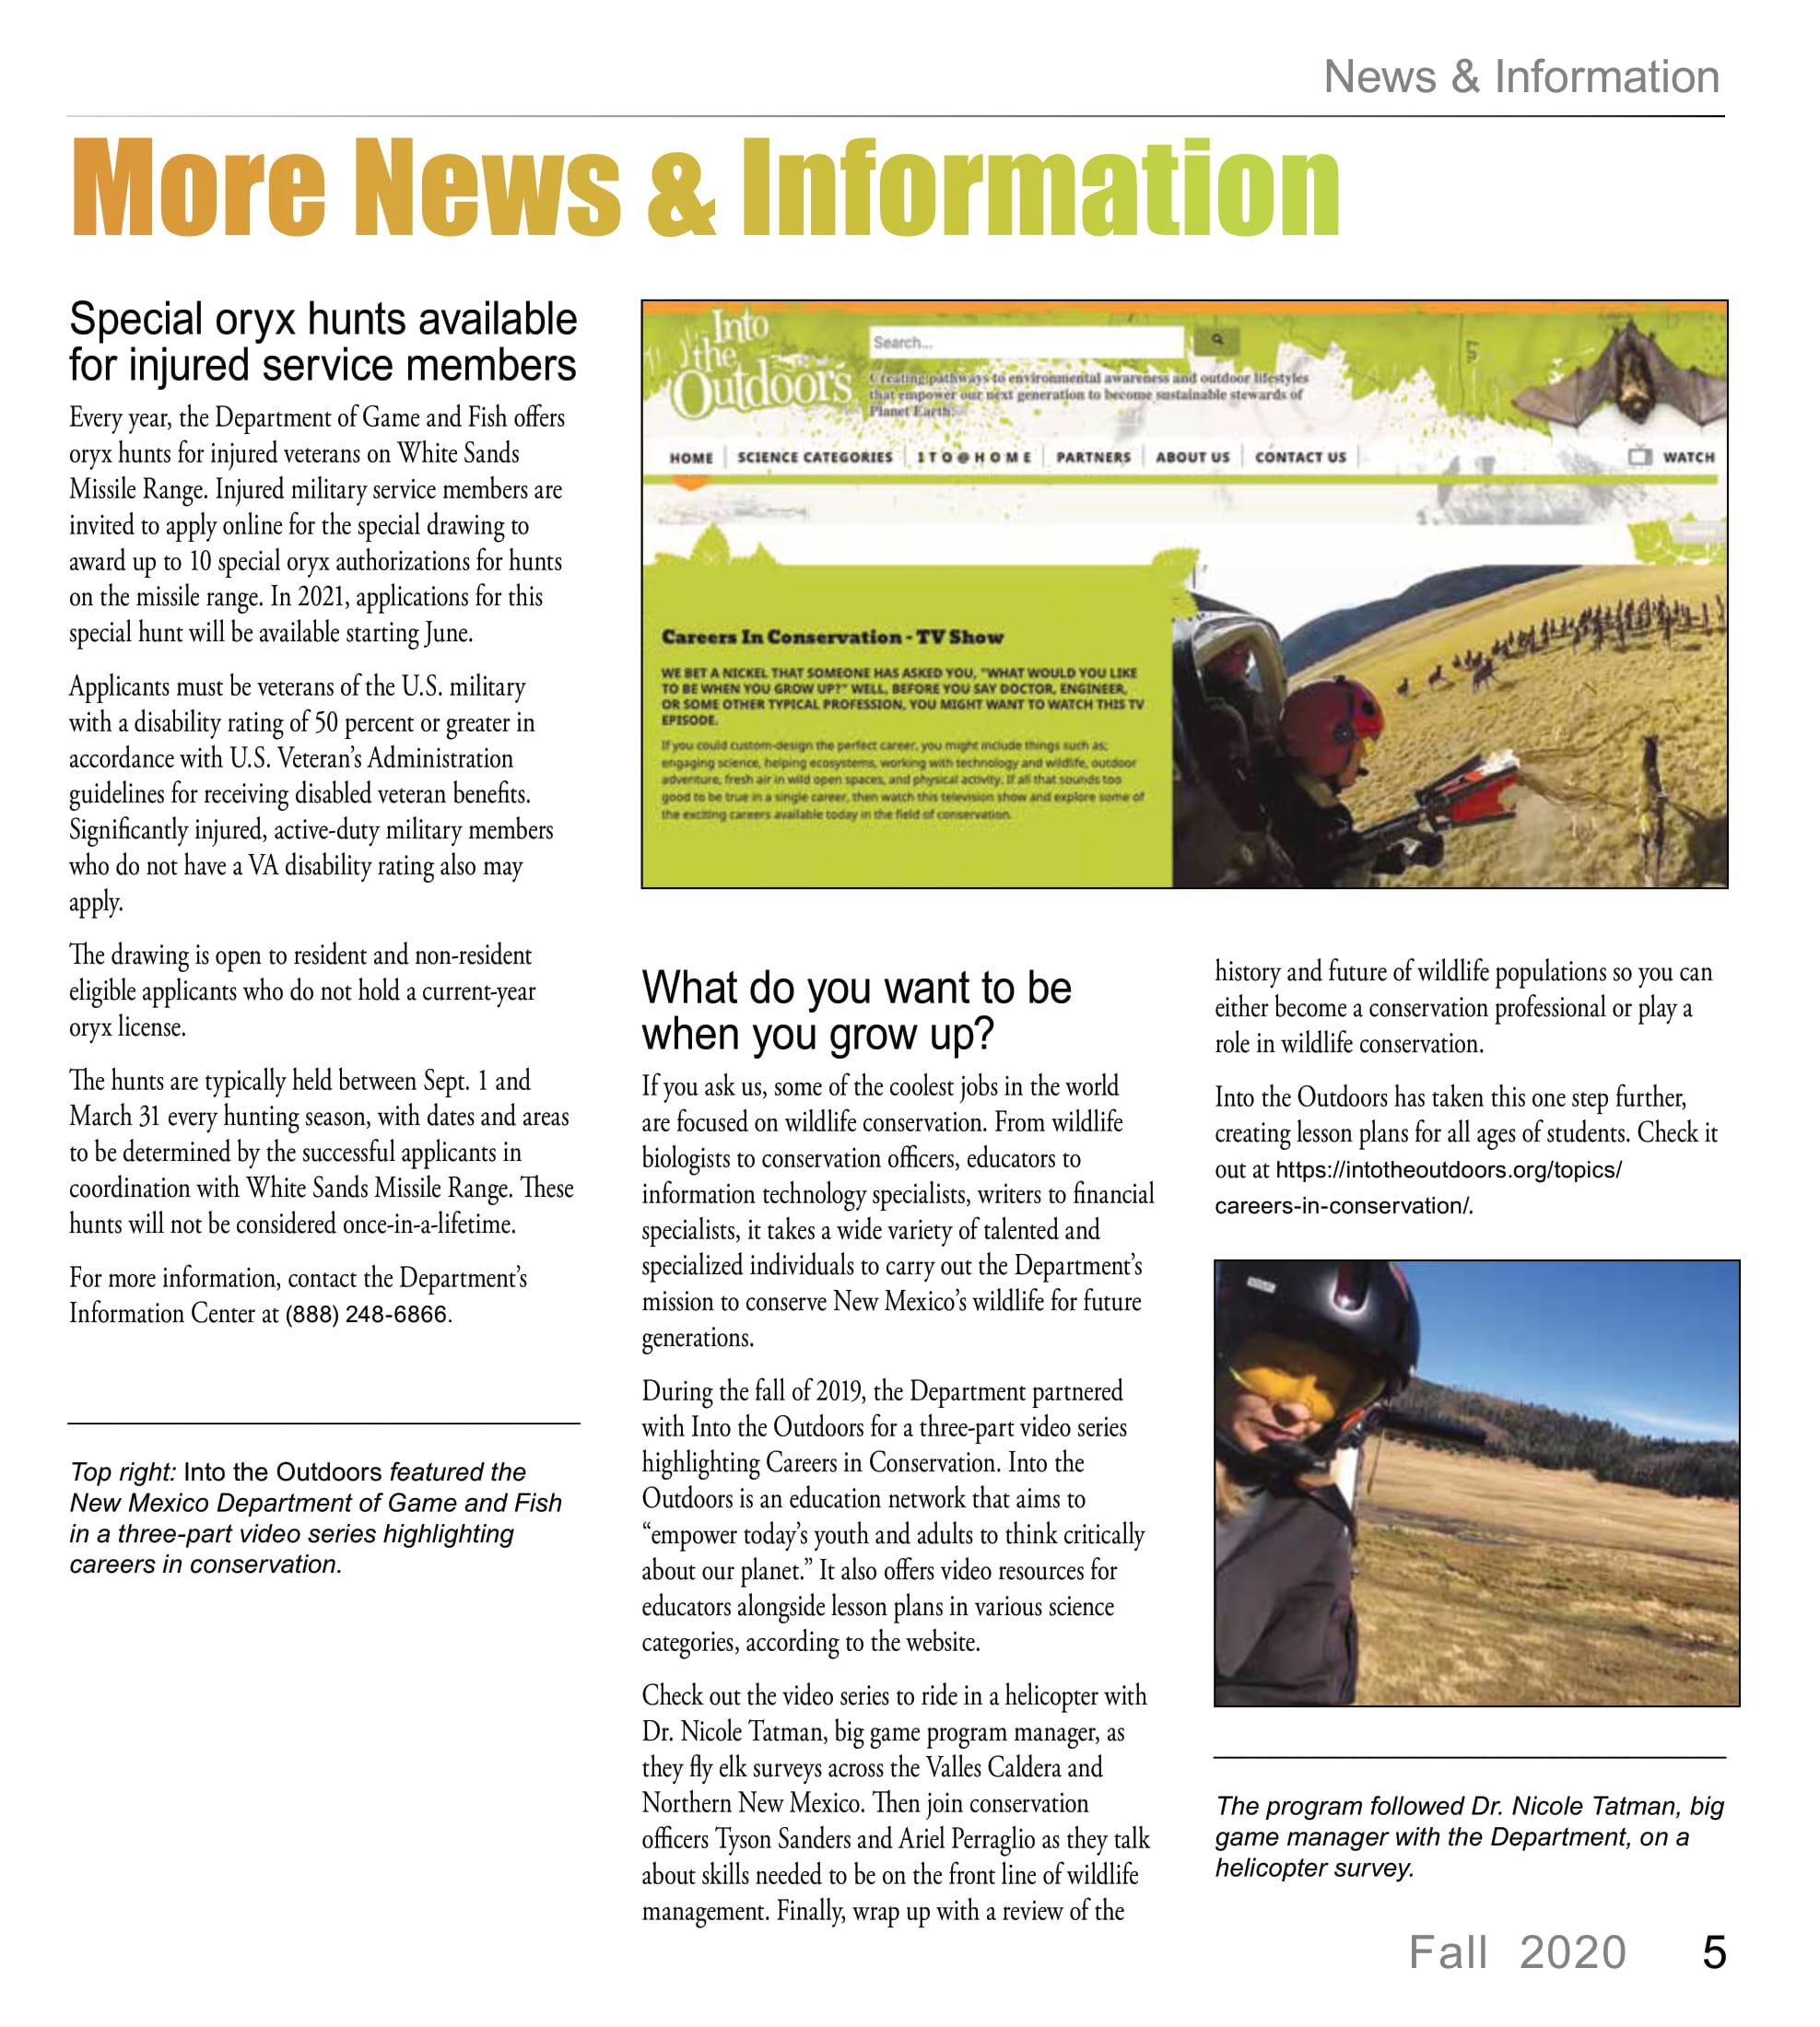 New-Mexico-Wildlife-Magazine-Volume-62-Number-4-Fall-2020-05.jpg